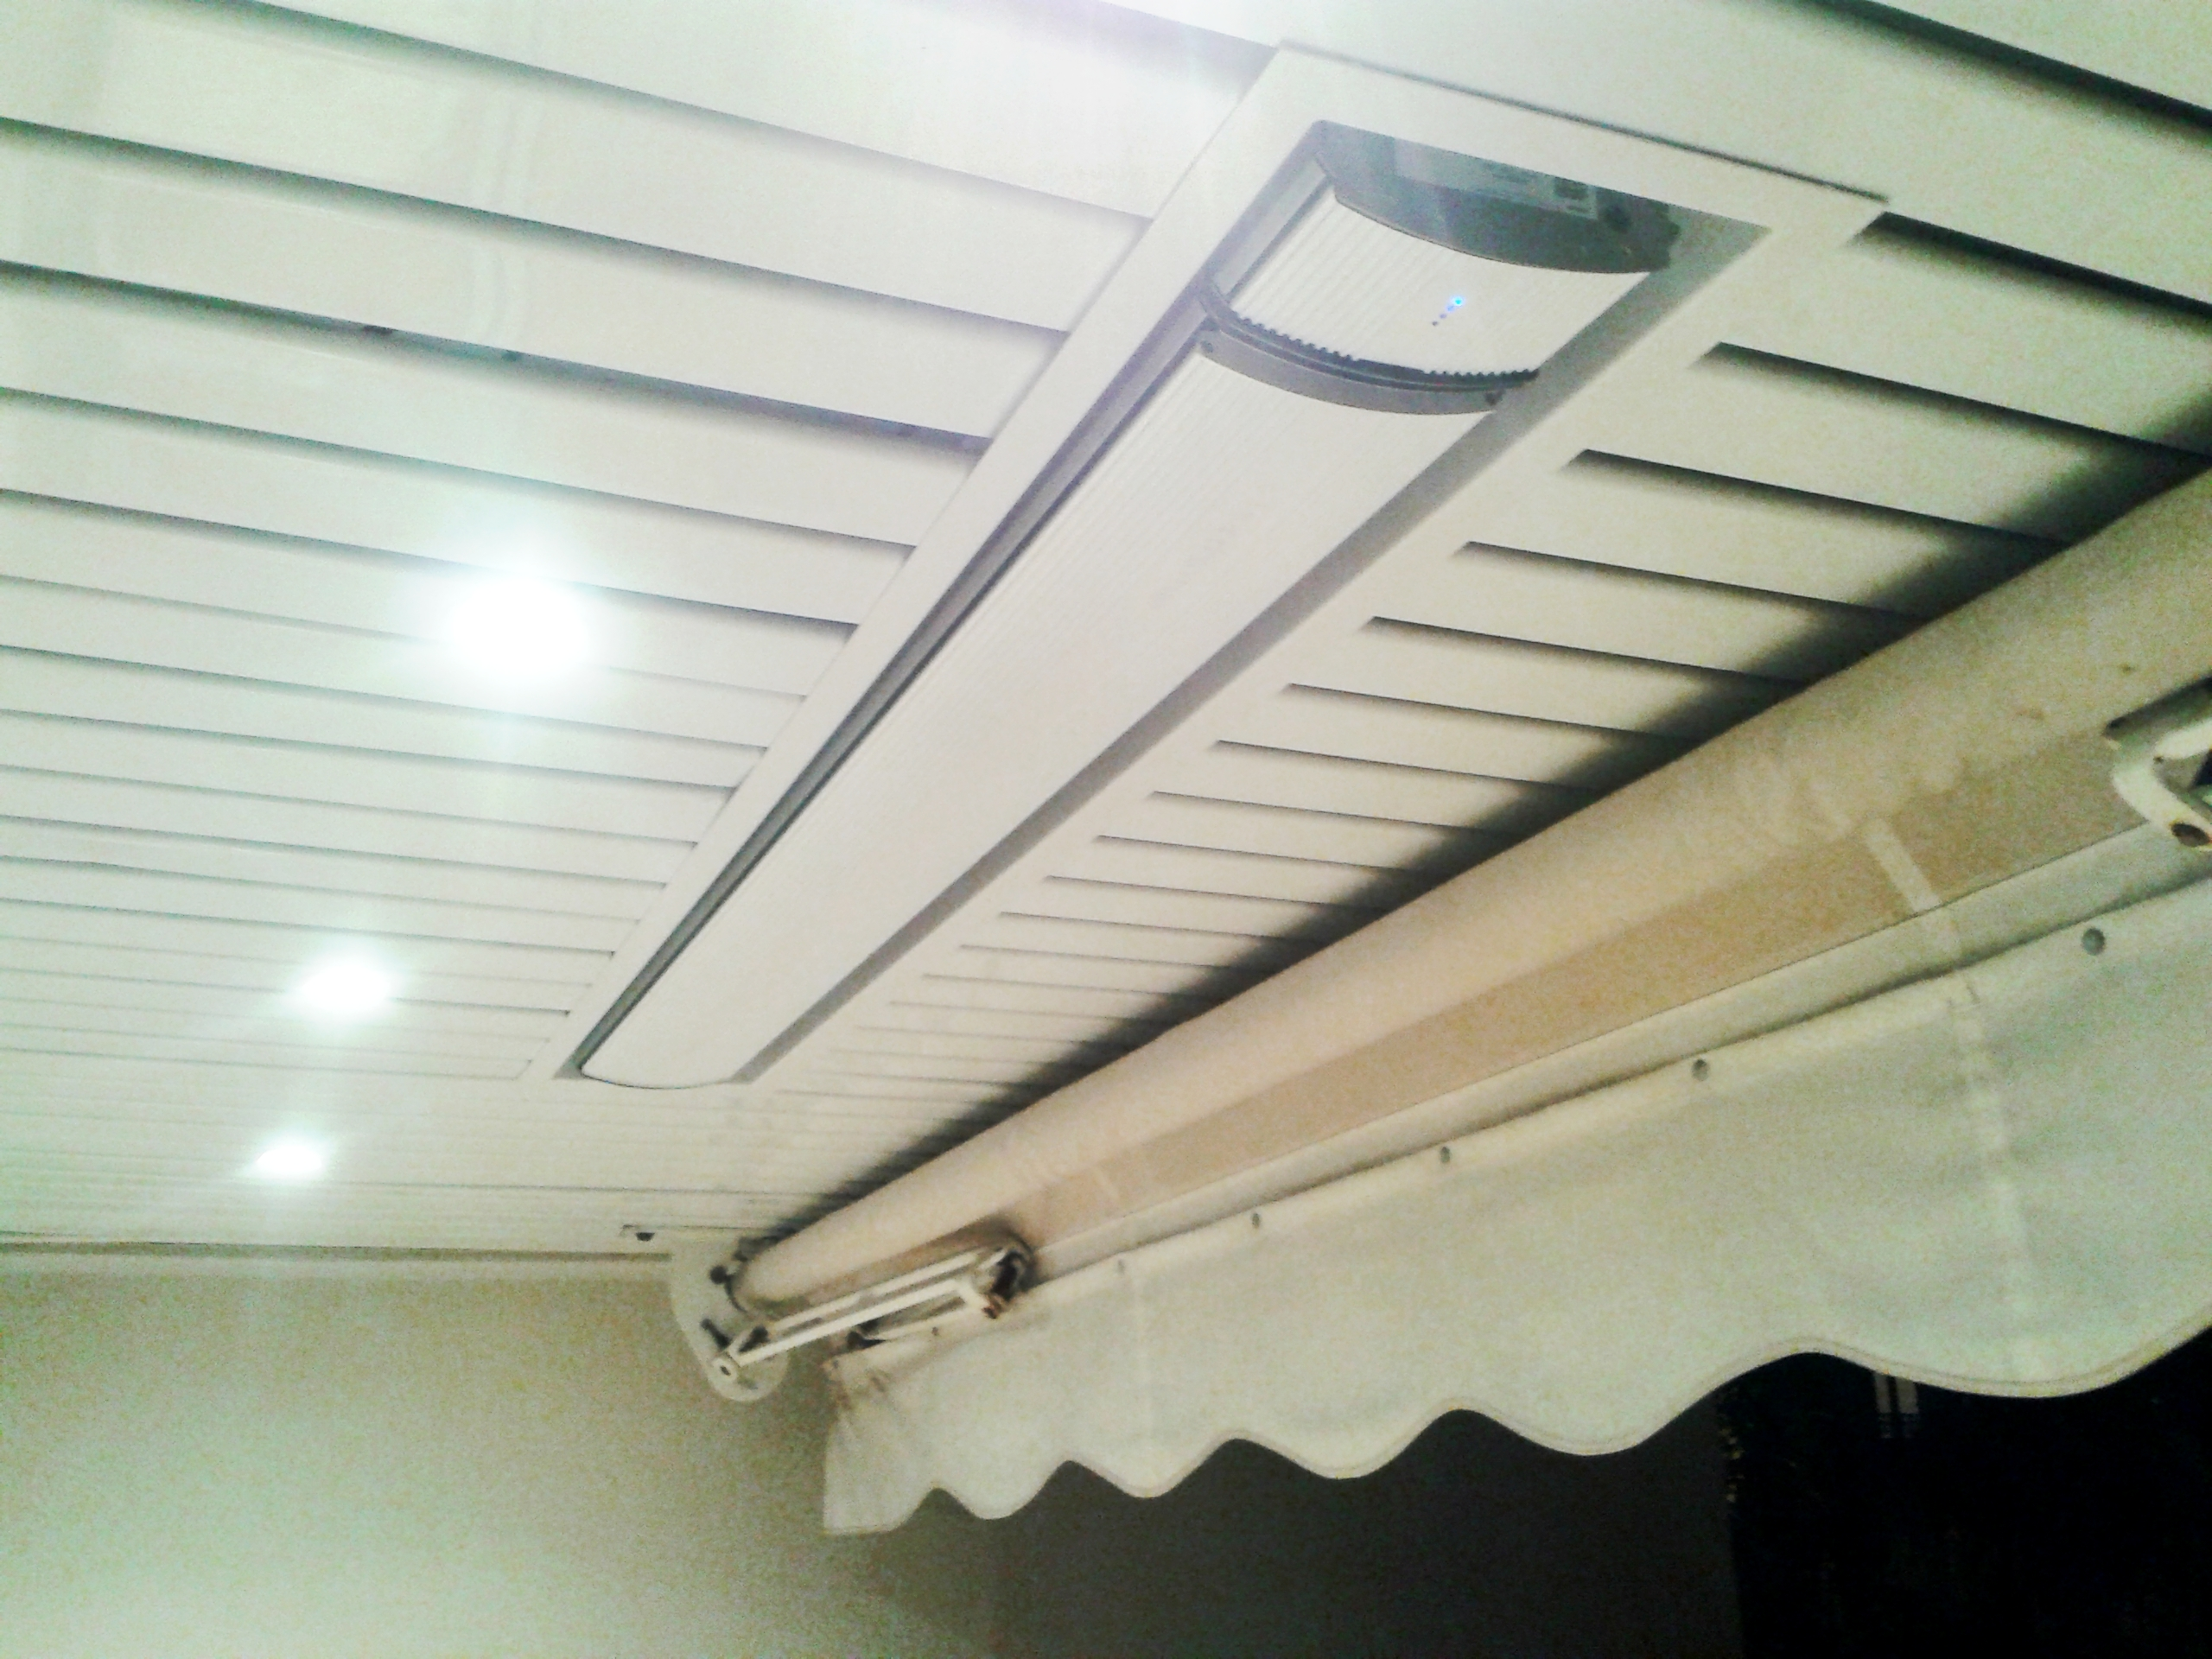 Rayonnant heatsrip mhs dans un faux plafond d 39 un balcon heatscope franc - Chauffage radiant plafond ...